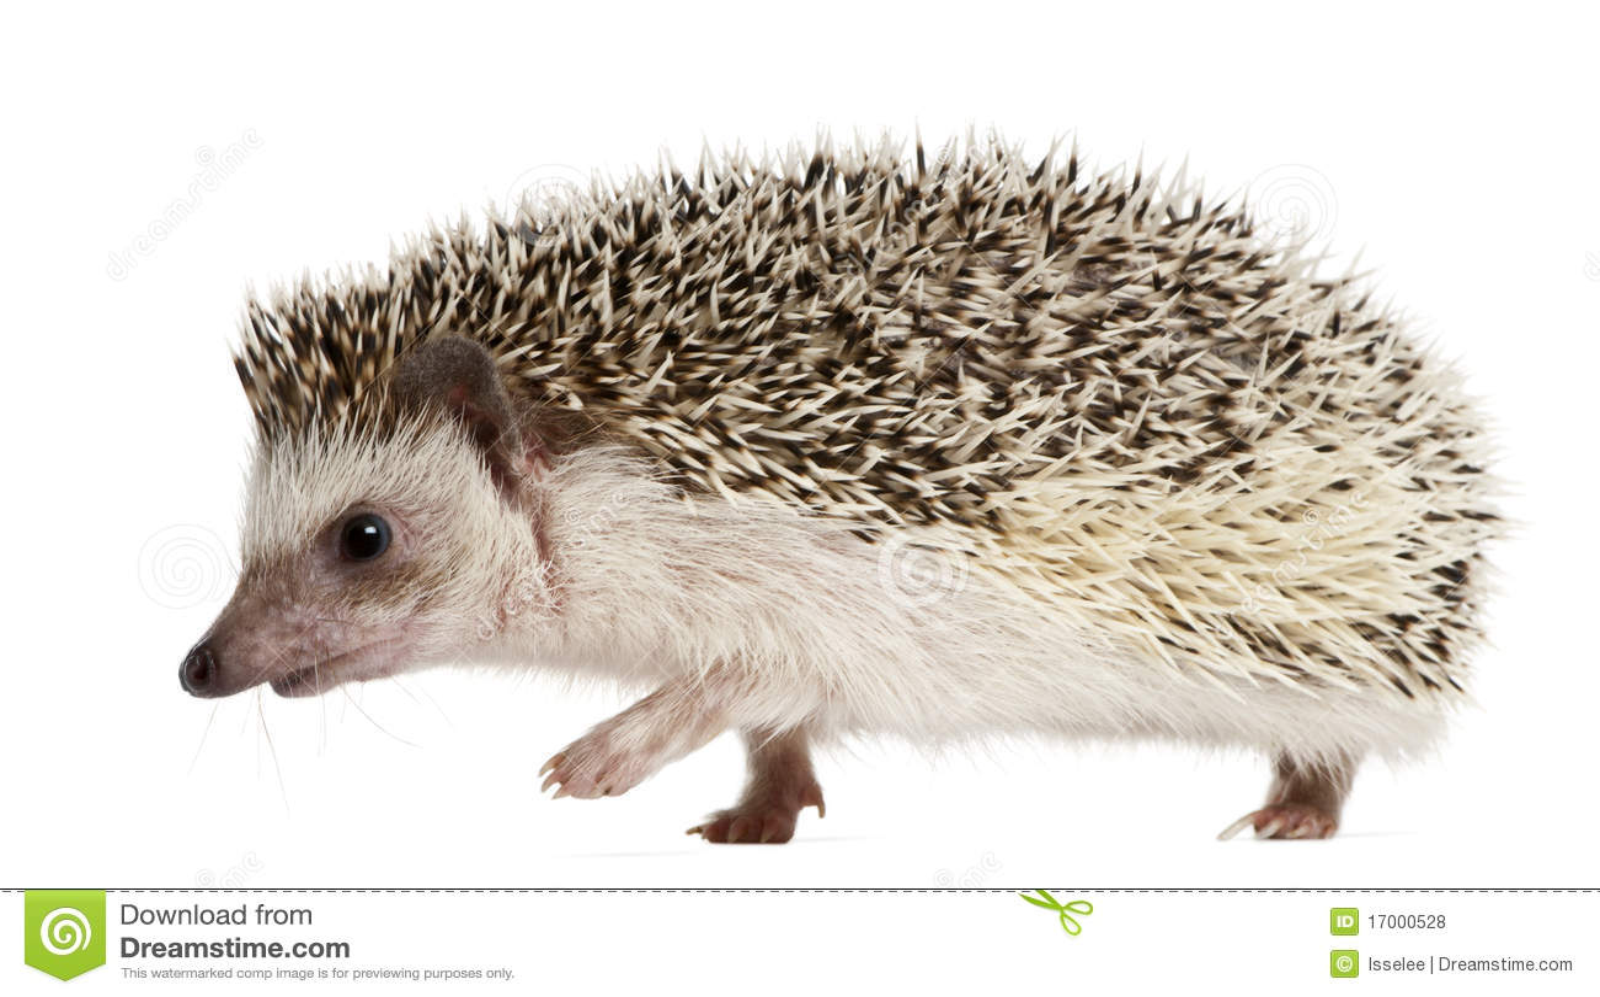 four-toed-hedgehog-atelerix-albiventris-